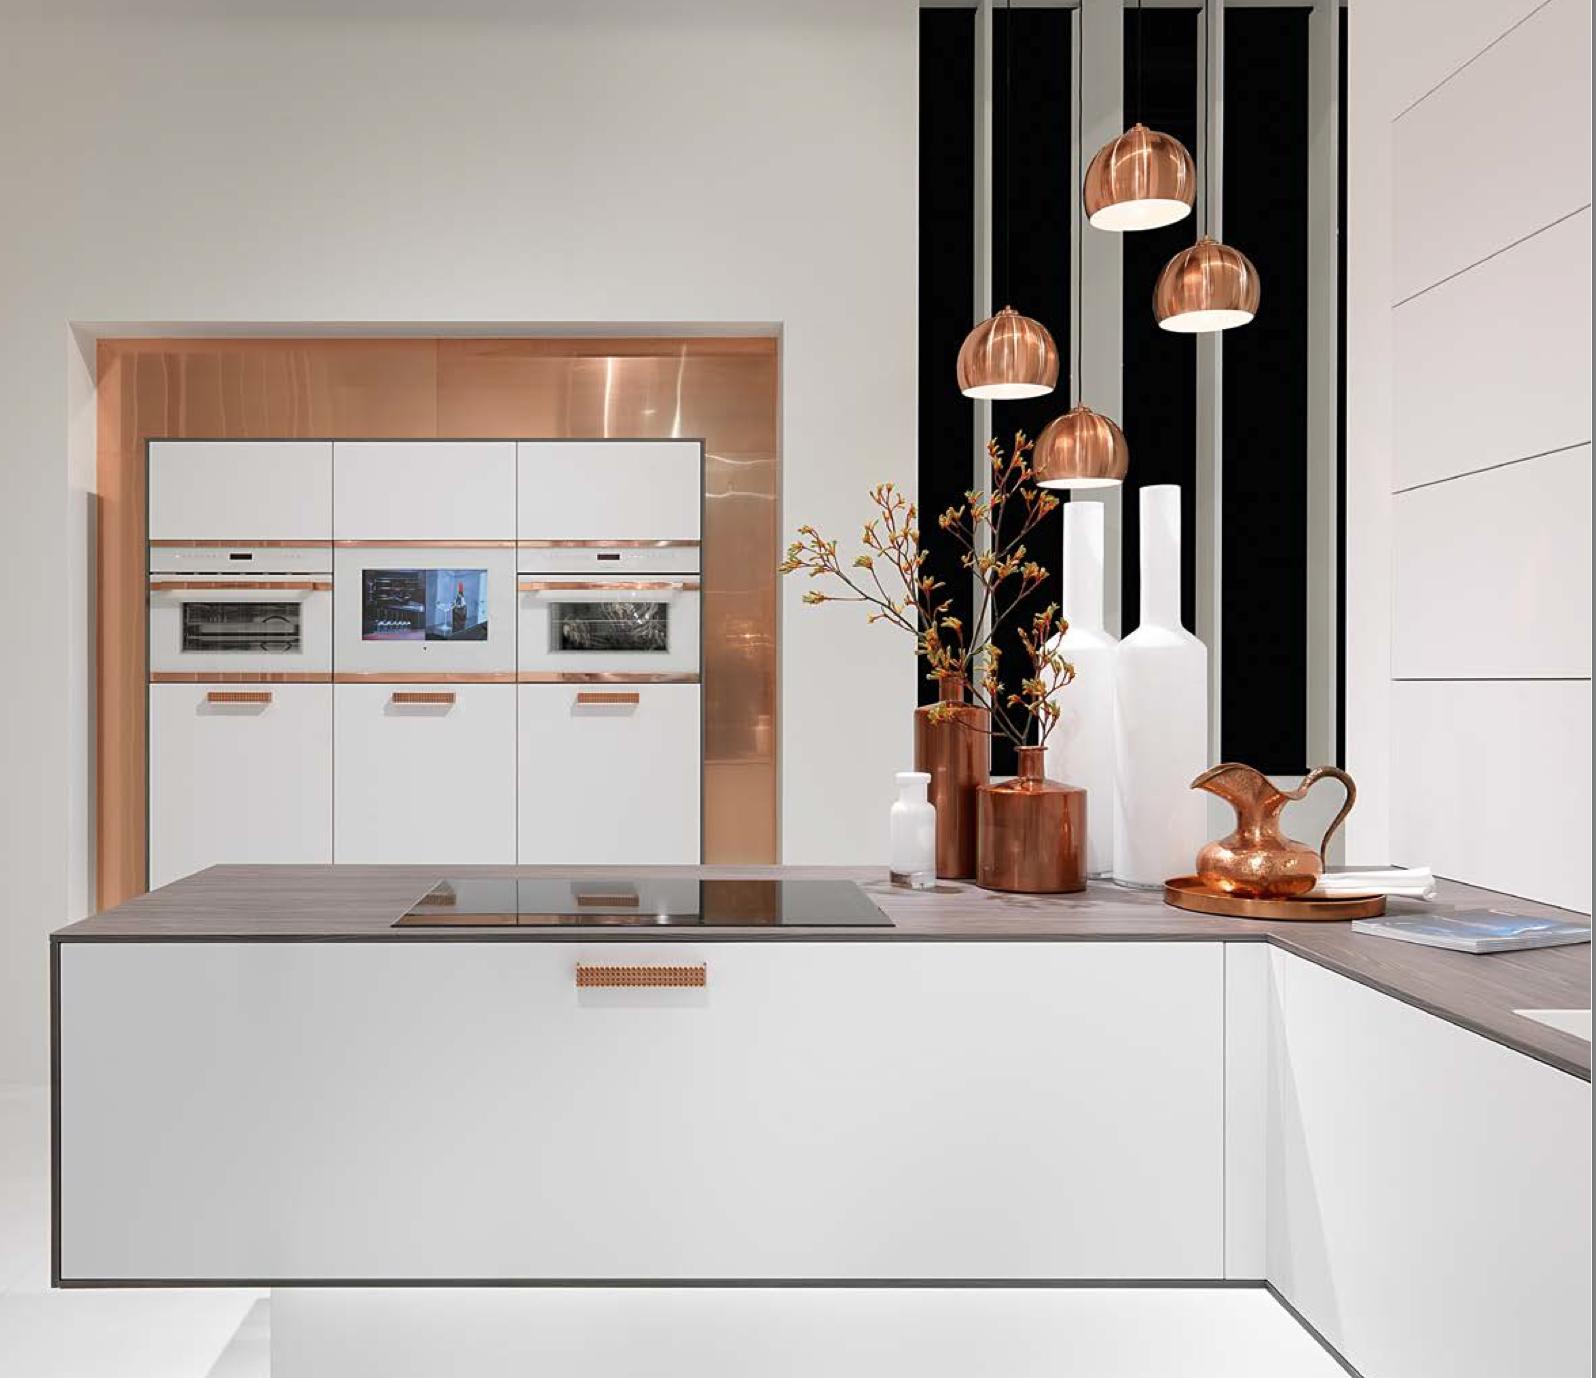 white and copper kitchen | Küche | Pinterest | Copper kitchen and ...